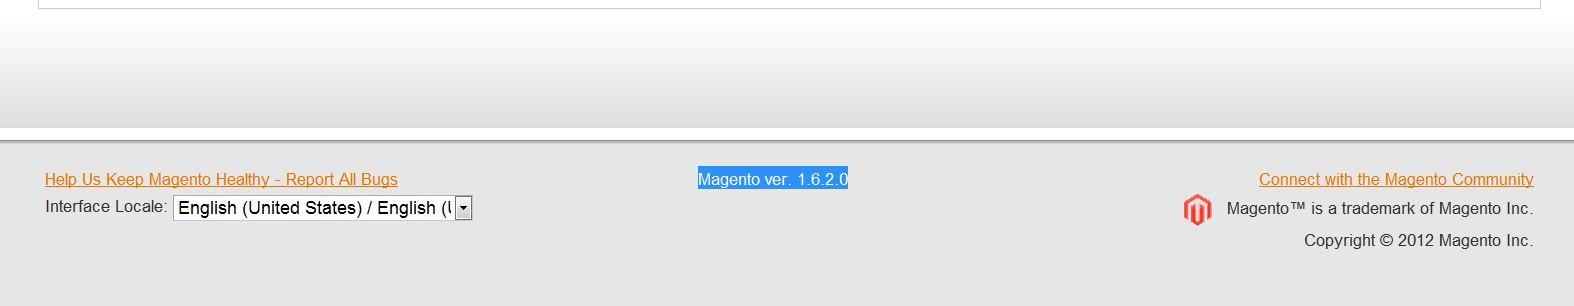 magento_dashboard_1